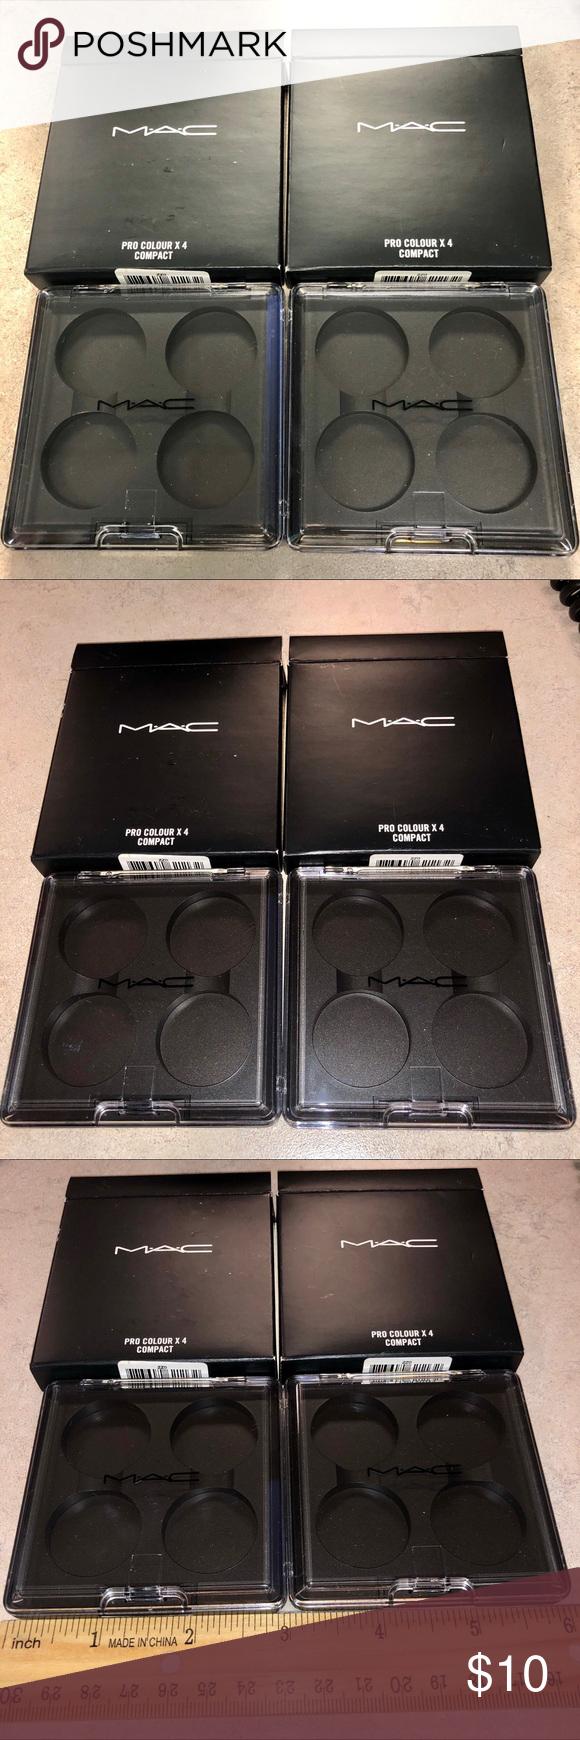 Mac Cosmetics Pro X4 Empty Eyeshadow Pan Lot Of 2 Mac Cosmetics Empty Eyeshadow Palette Eyeshadow Pans